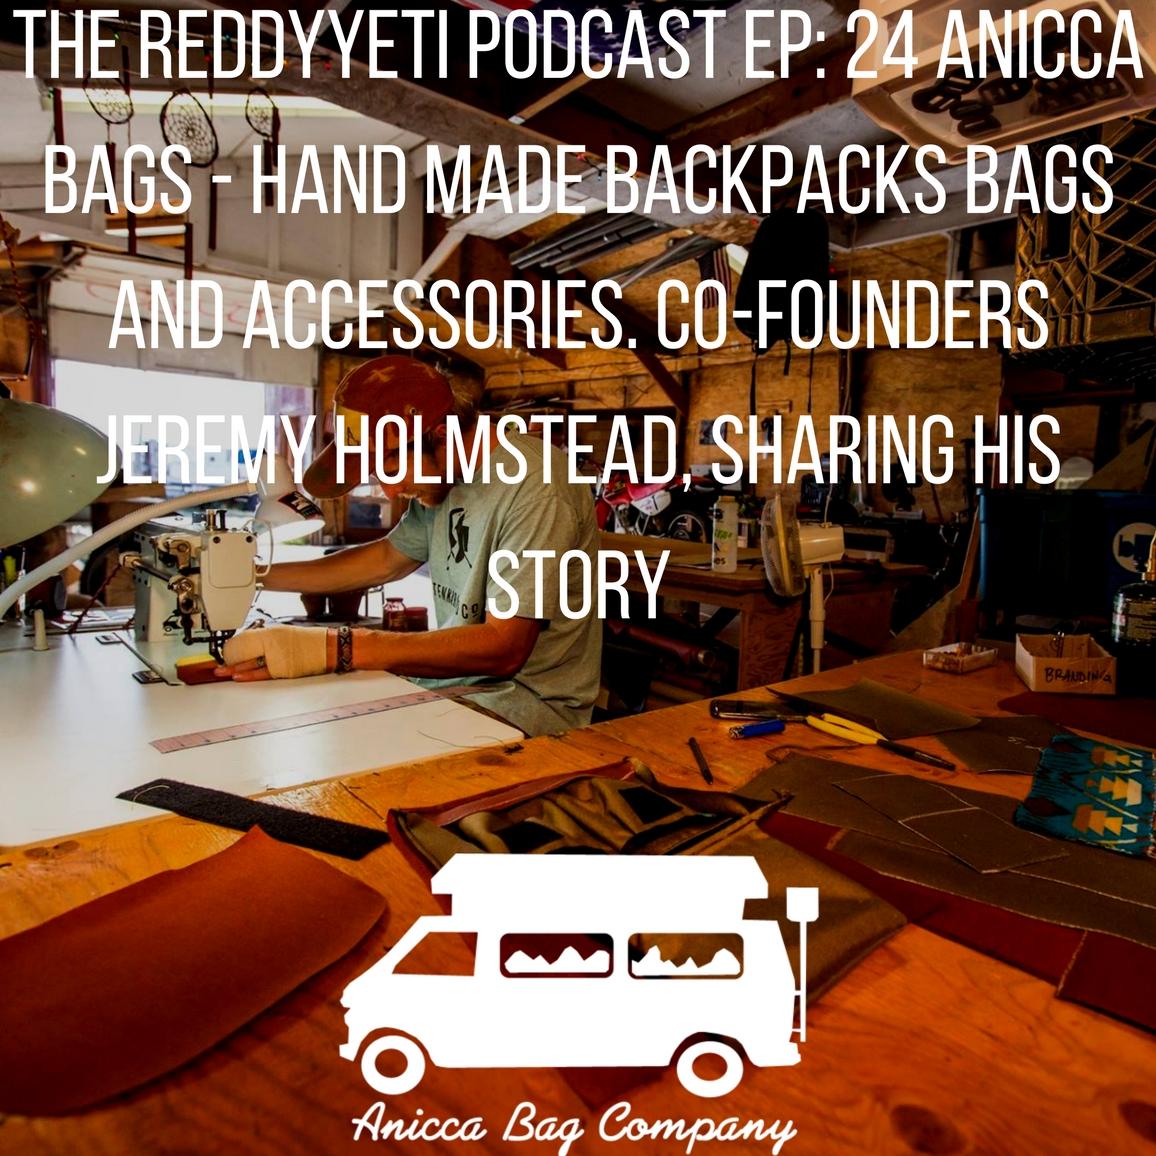 Anicca Bags Podcast Image.jpg